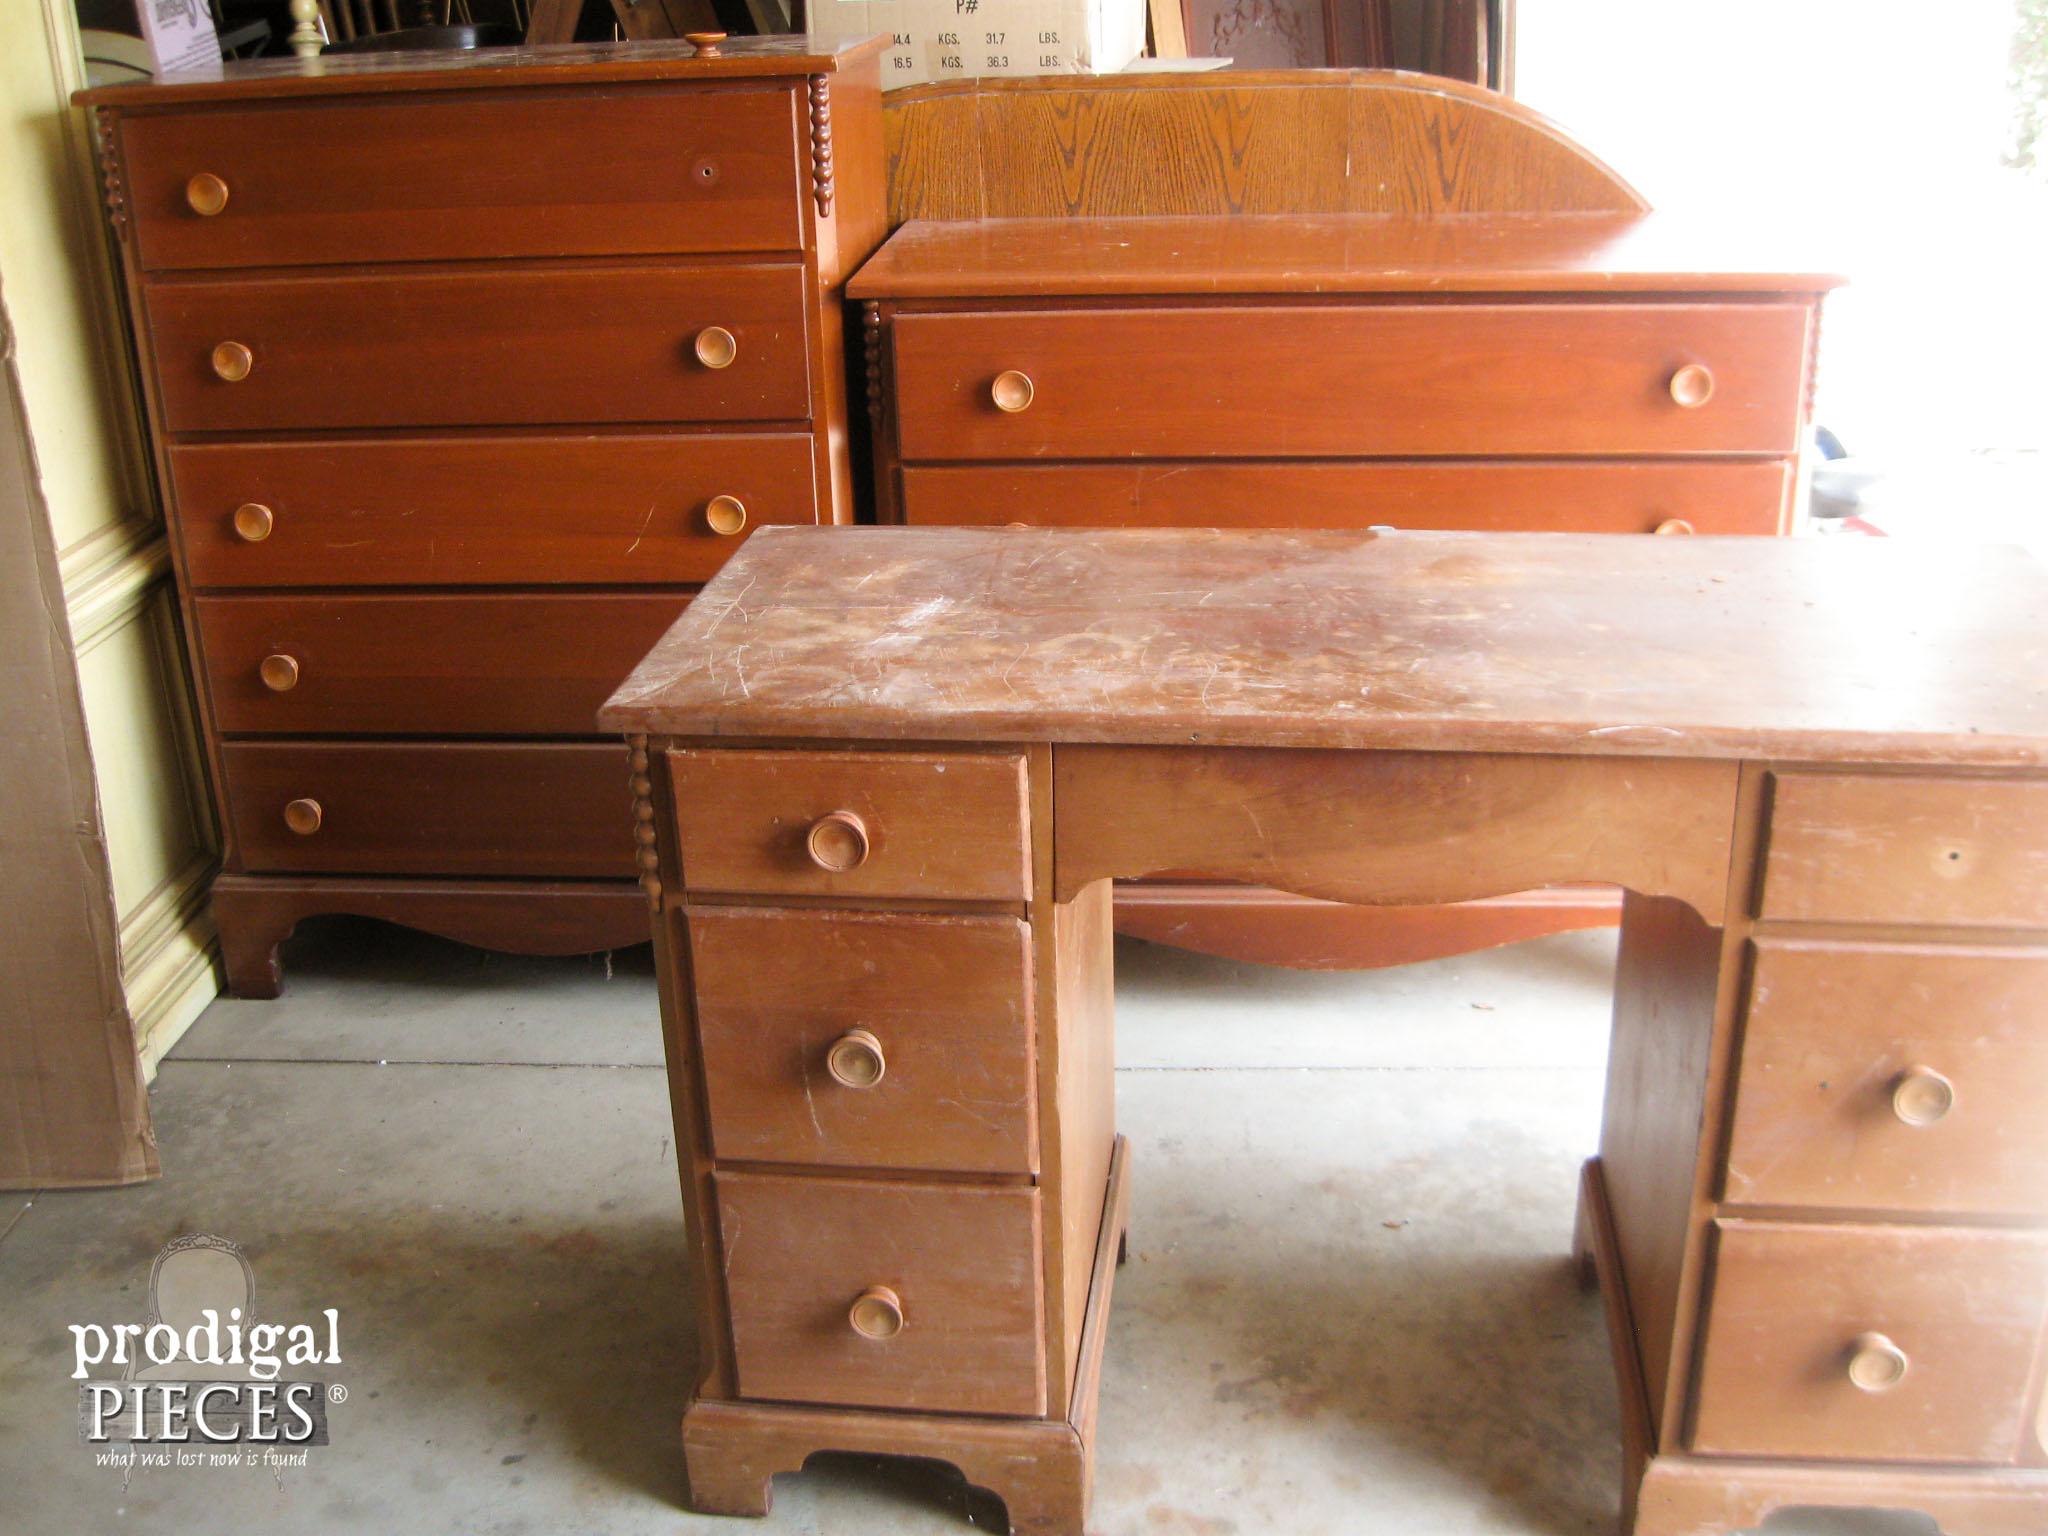 Vintage Cherry Bedroom Set Reunited | Prodigal Pieces | www.prodigalpieces.com